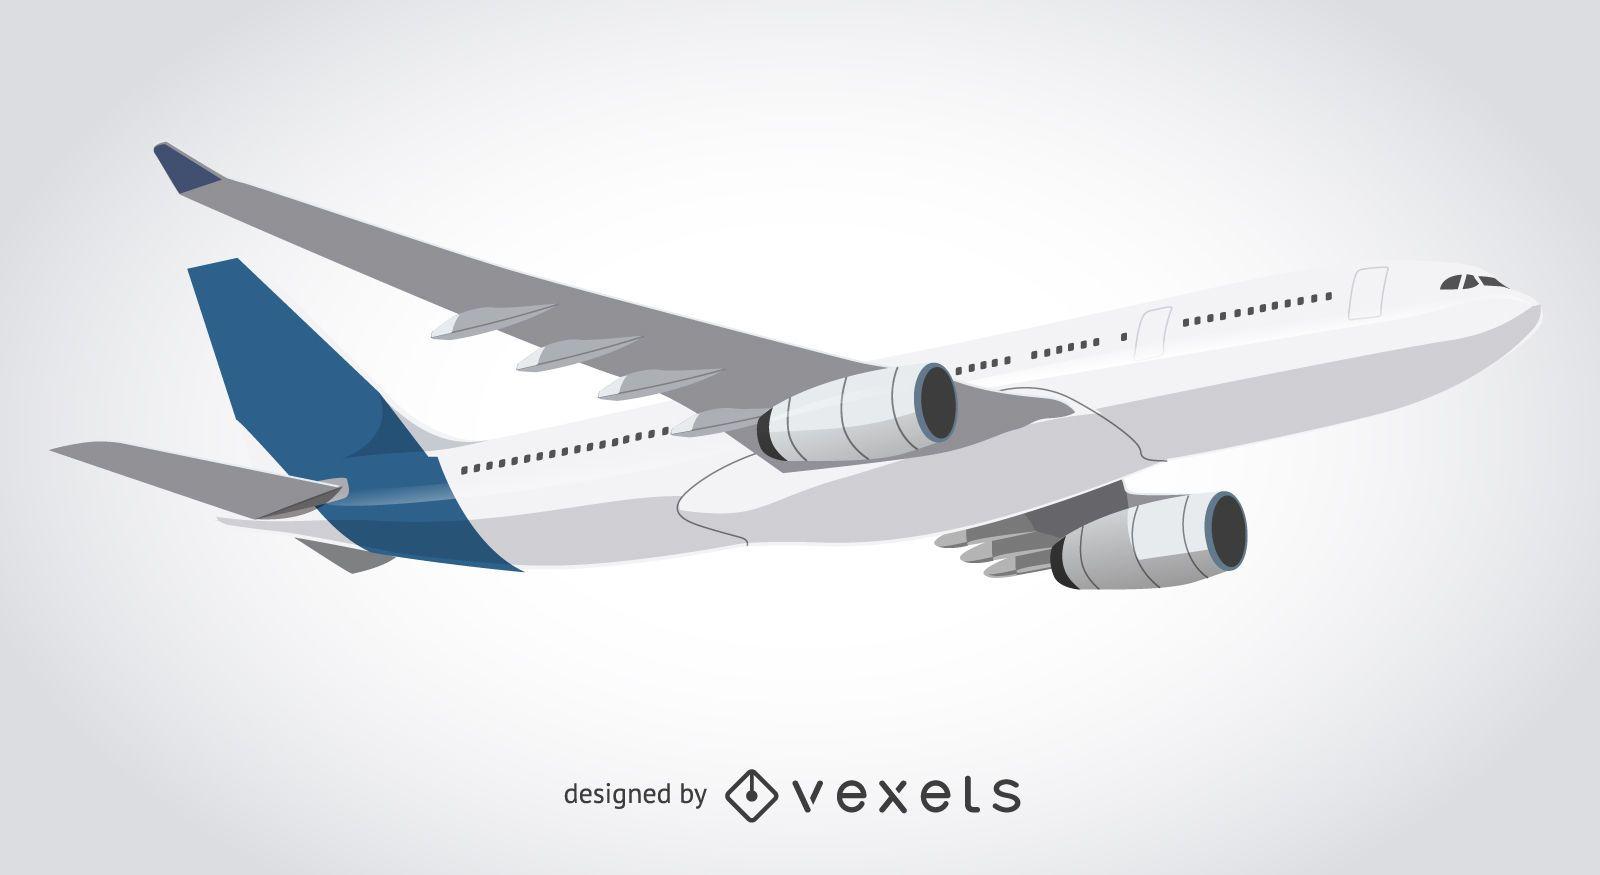 Airplane taking off illustration